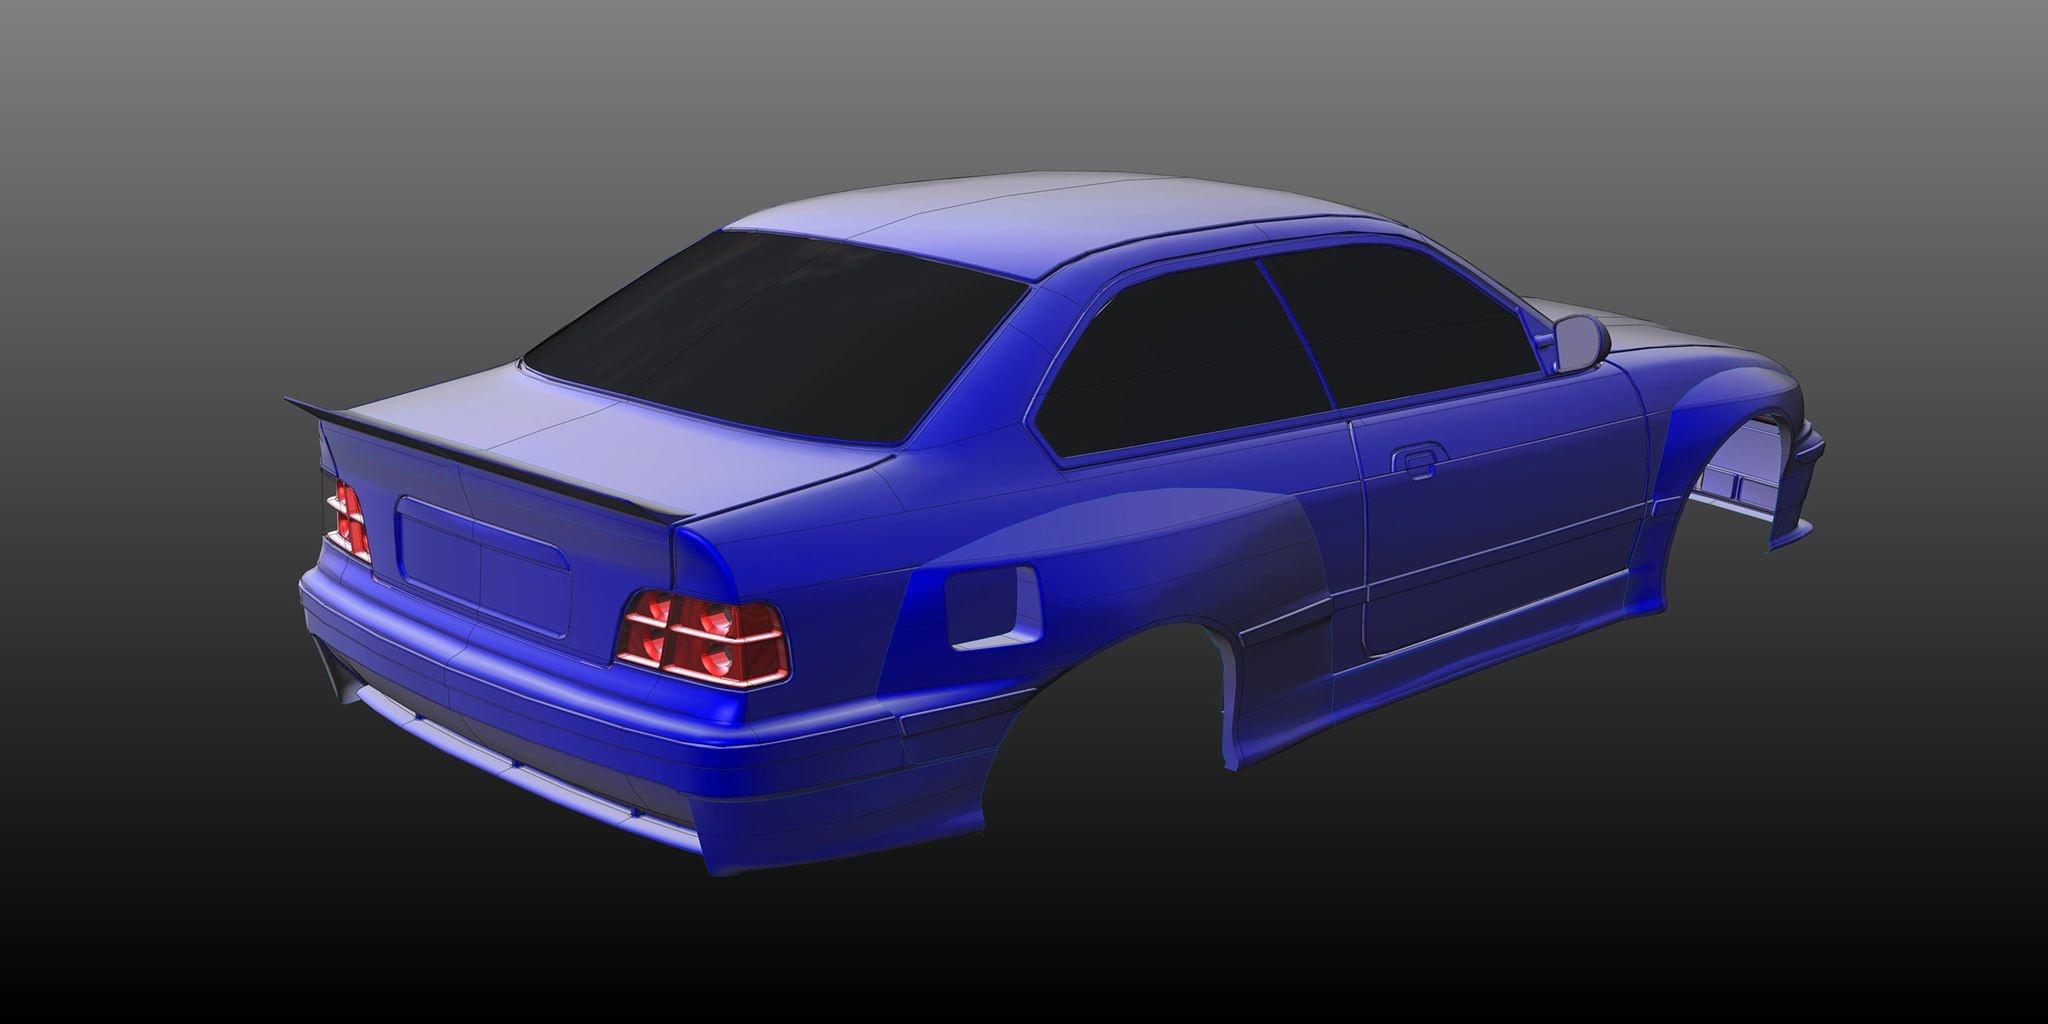 Rc Arlos - RC-E36M3WBK - Wide Body Kit for BMW M3 (E36